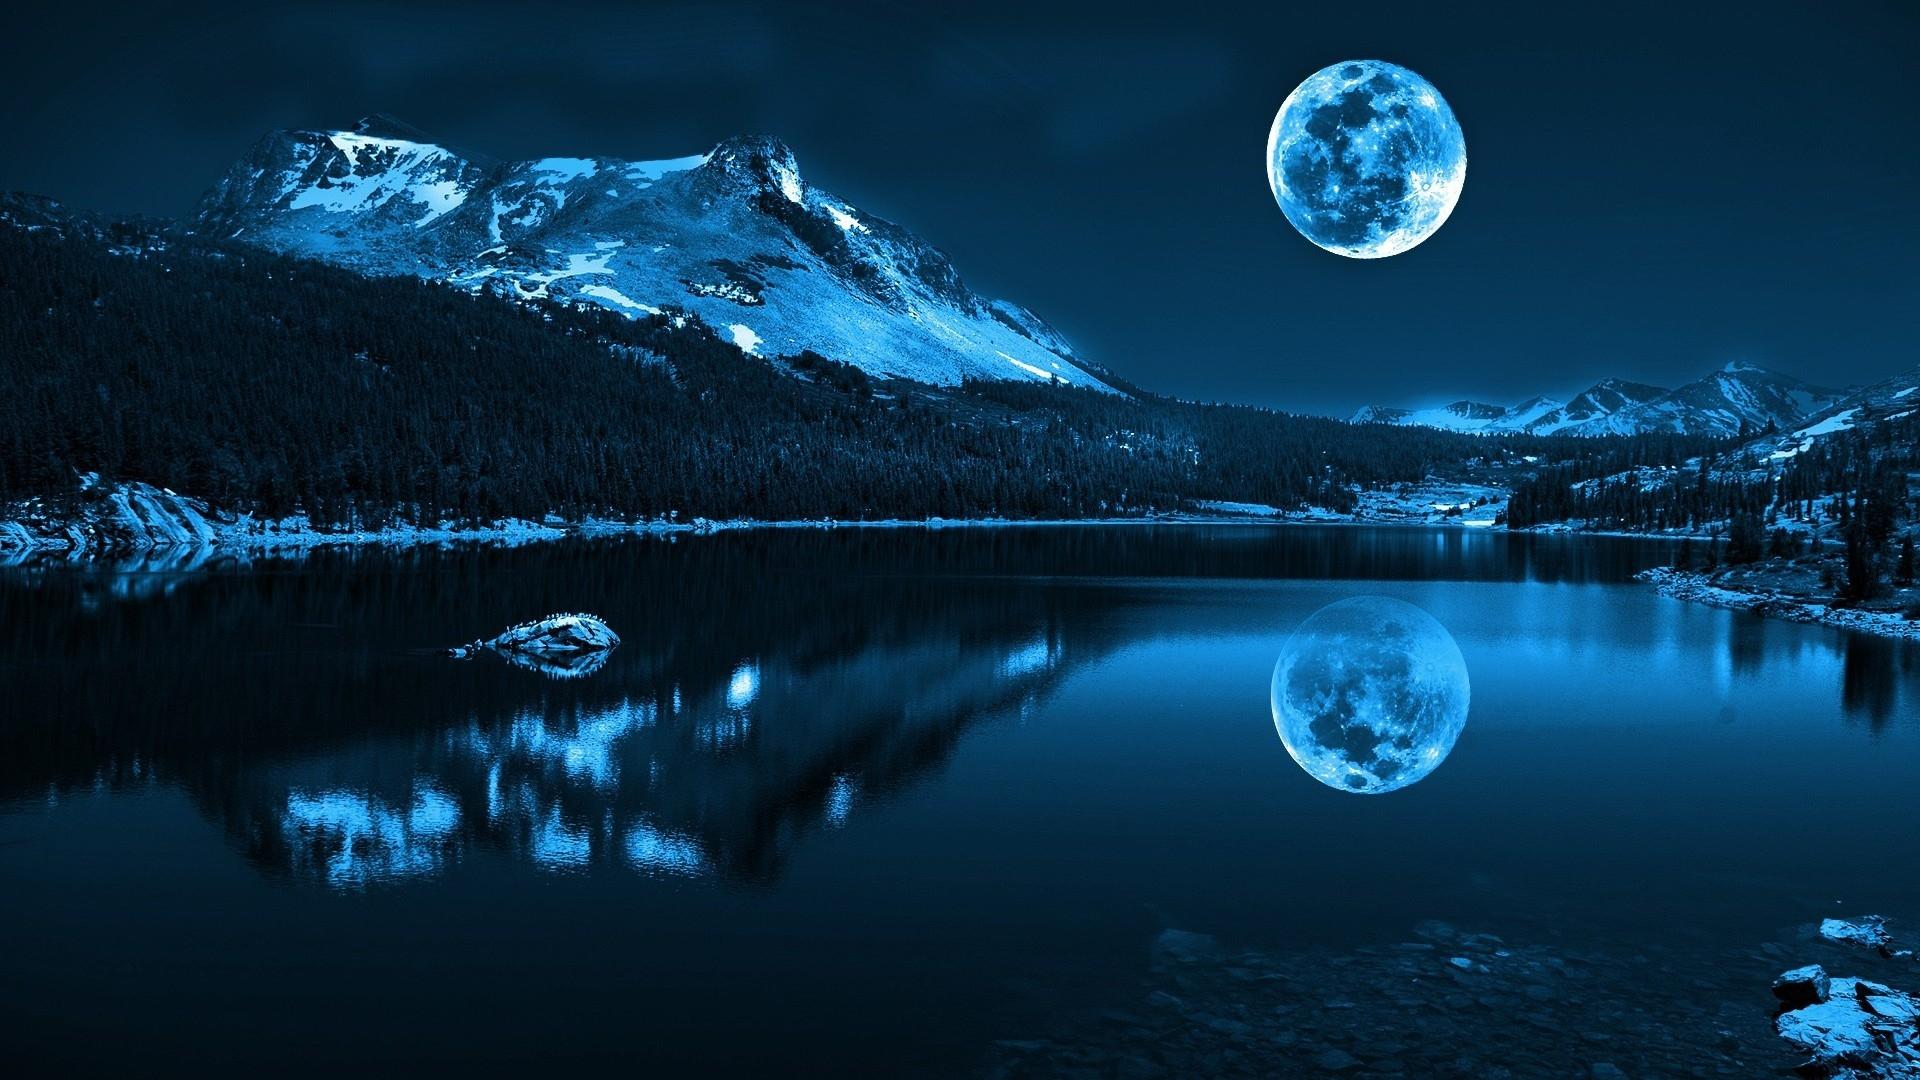 http://2.bp.blogspot.com/-RjMiBOAtZmg/UD2obTNw_8I/AAAAAAAAH9s/ntskWmaDq_o/s0/full-moon-1920x1080-wallpaper.jpg